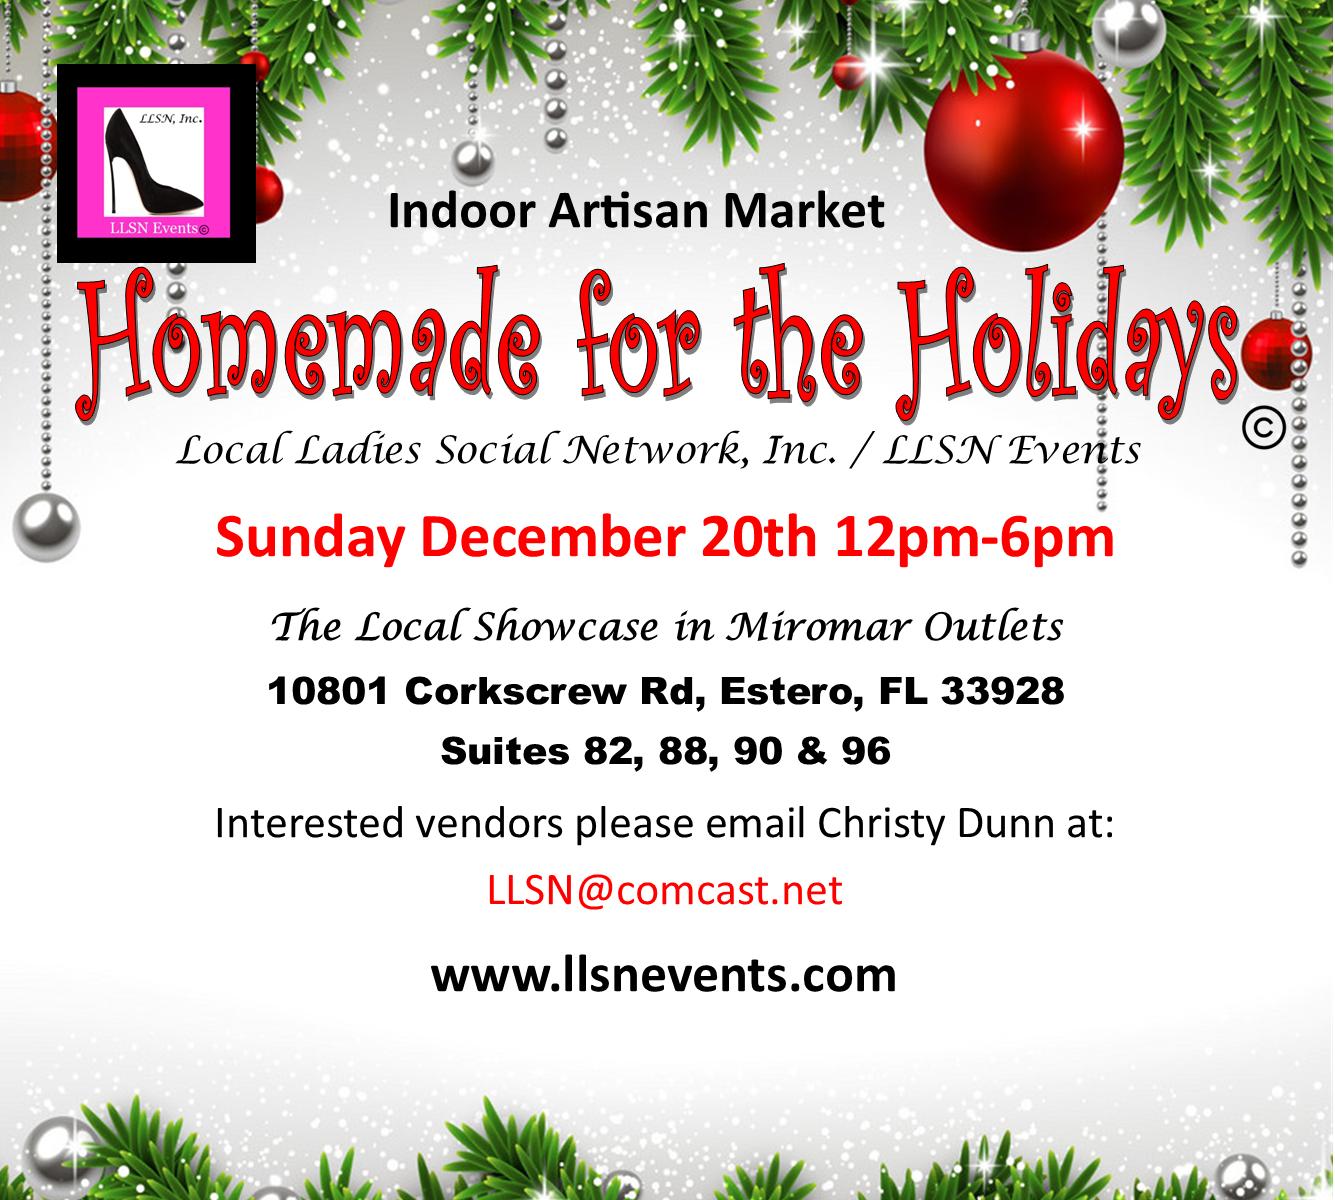 Handmade For The Holidays-Artisan Market Sun, Dec. 20th 12pm-6pm